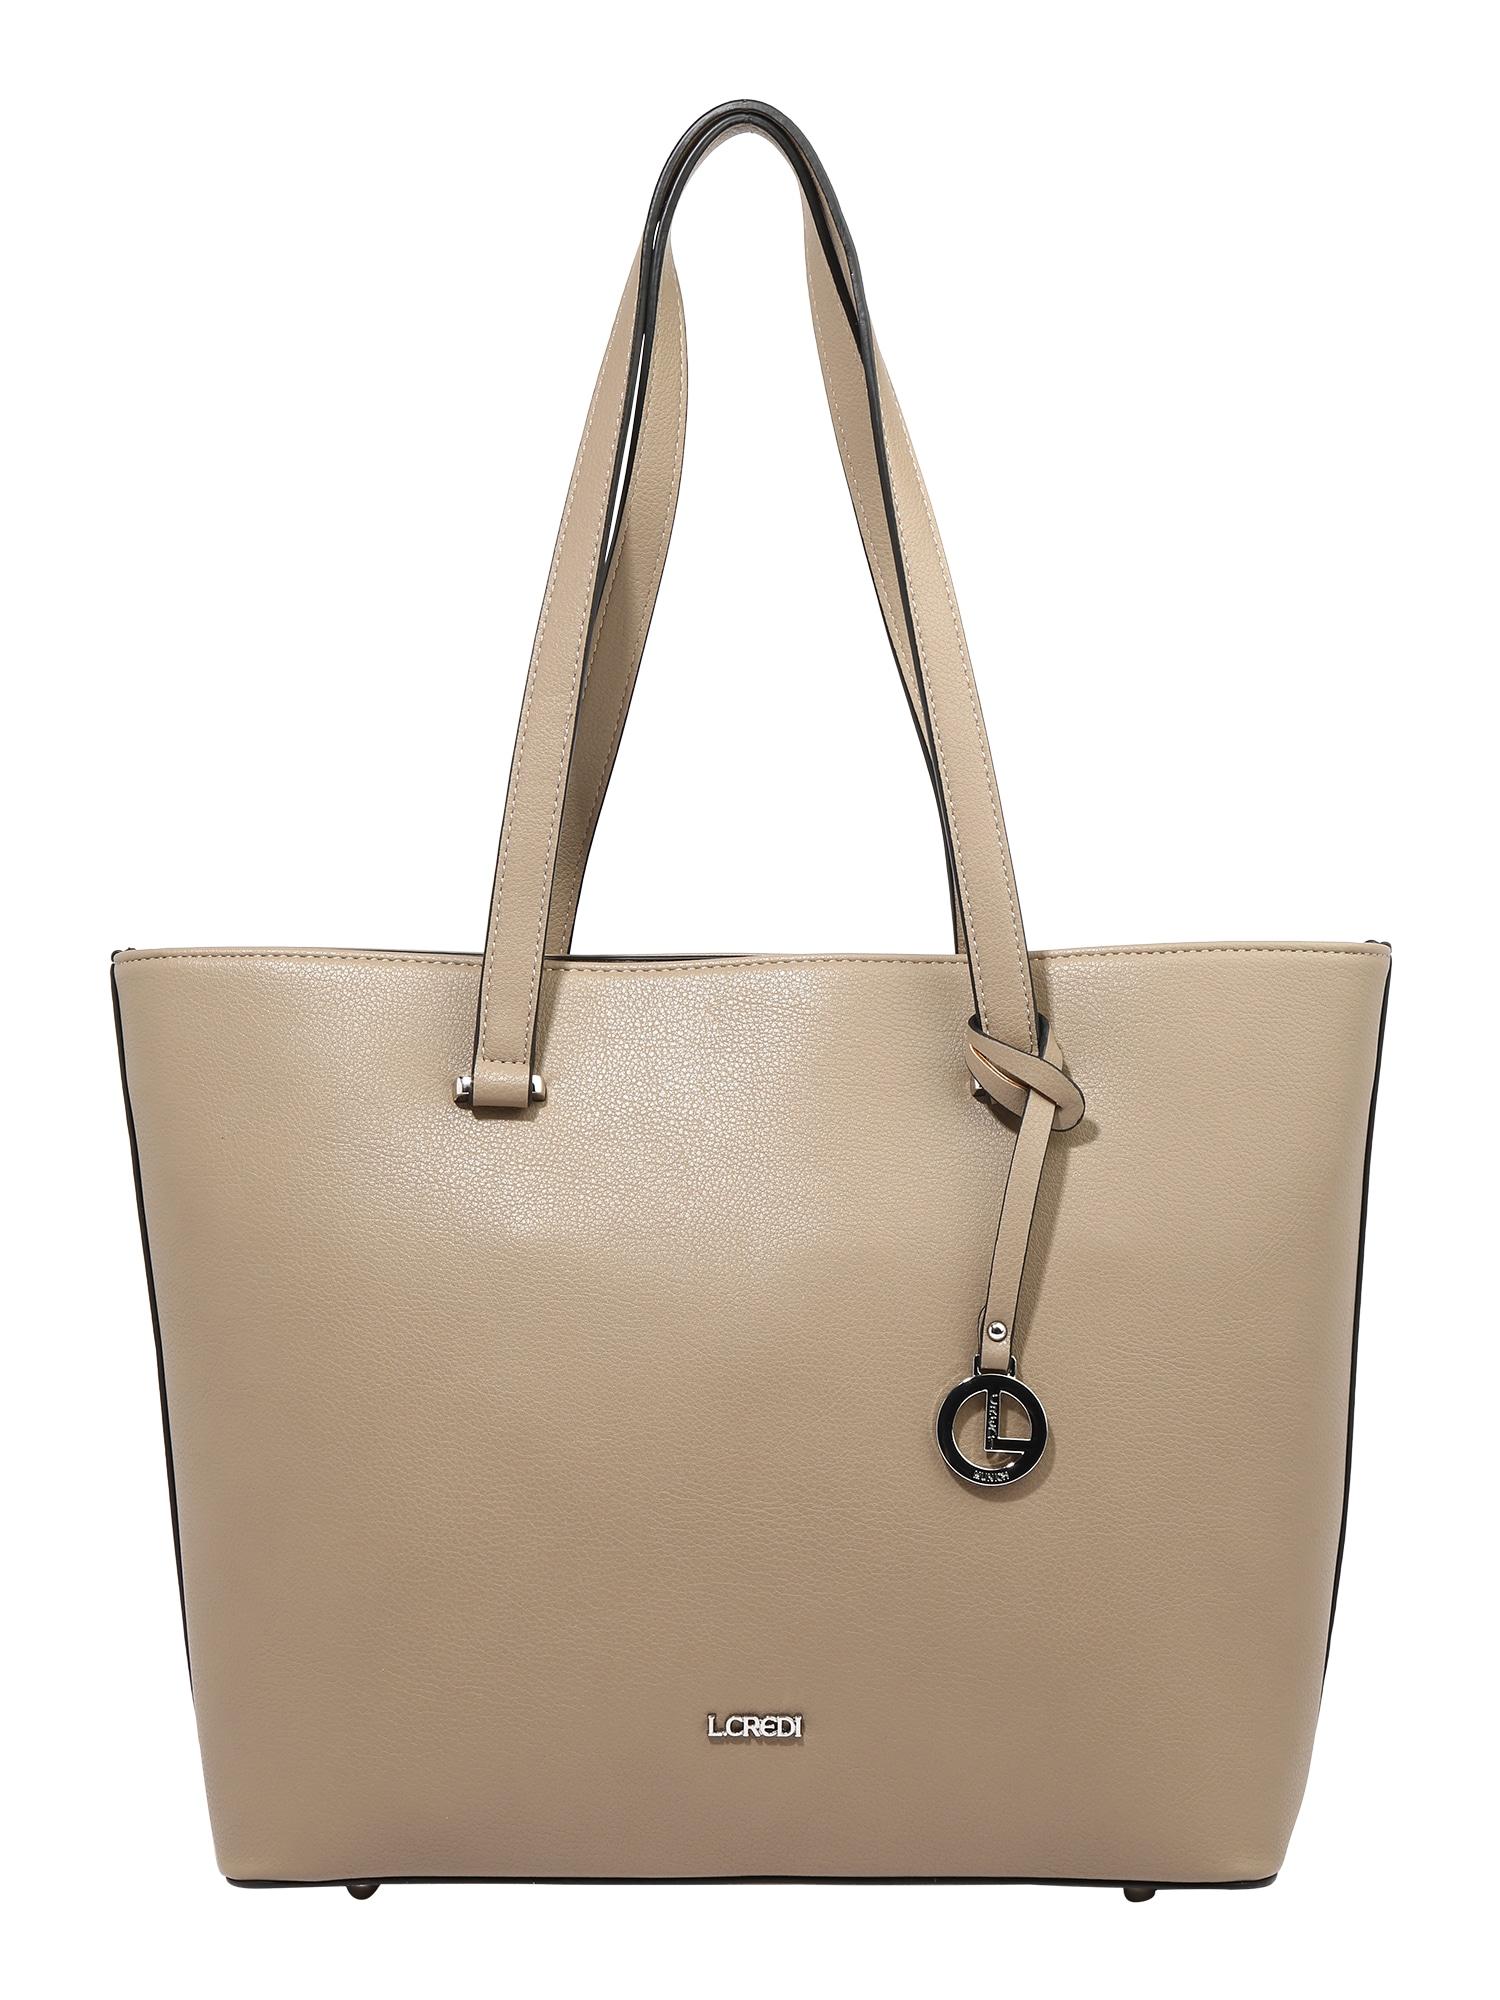 L.CREDI Pirkinių krepšys